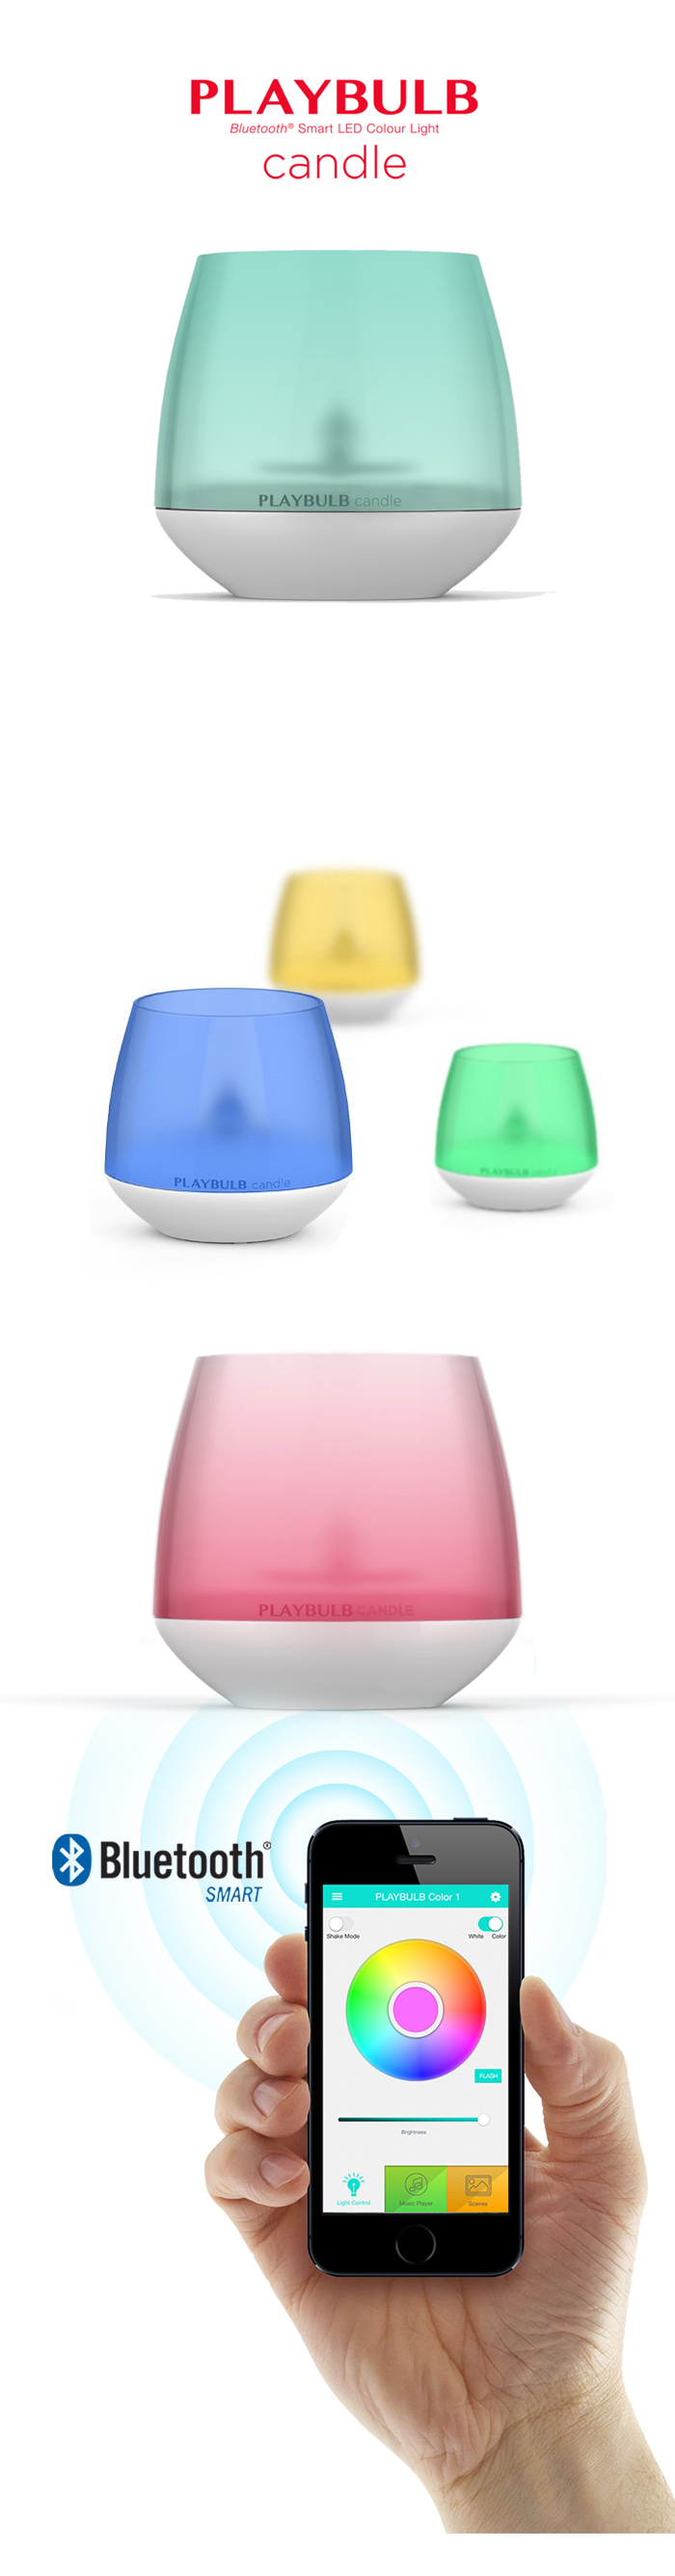 (大宗採購)MiPow PLAYBULB 魔泡 CANDLE 智慧LED蠟燭燈